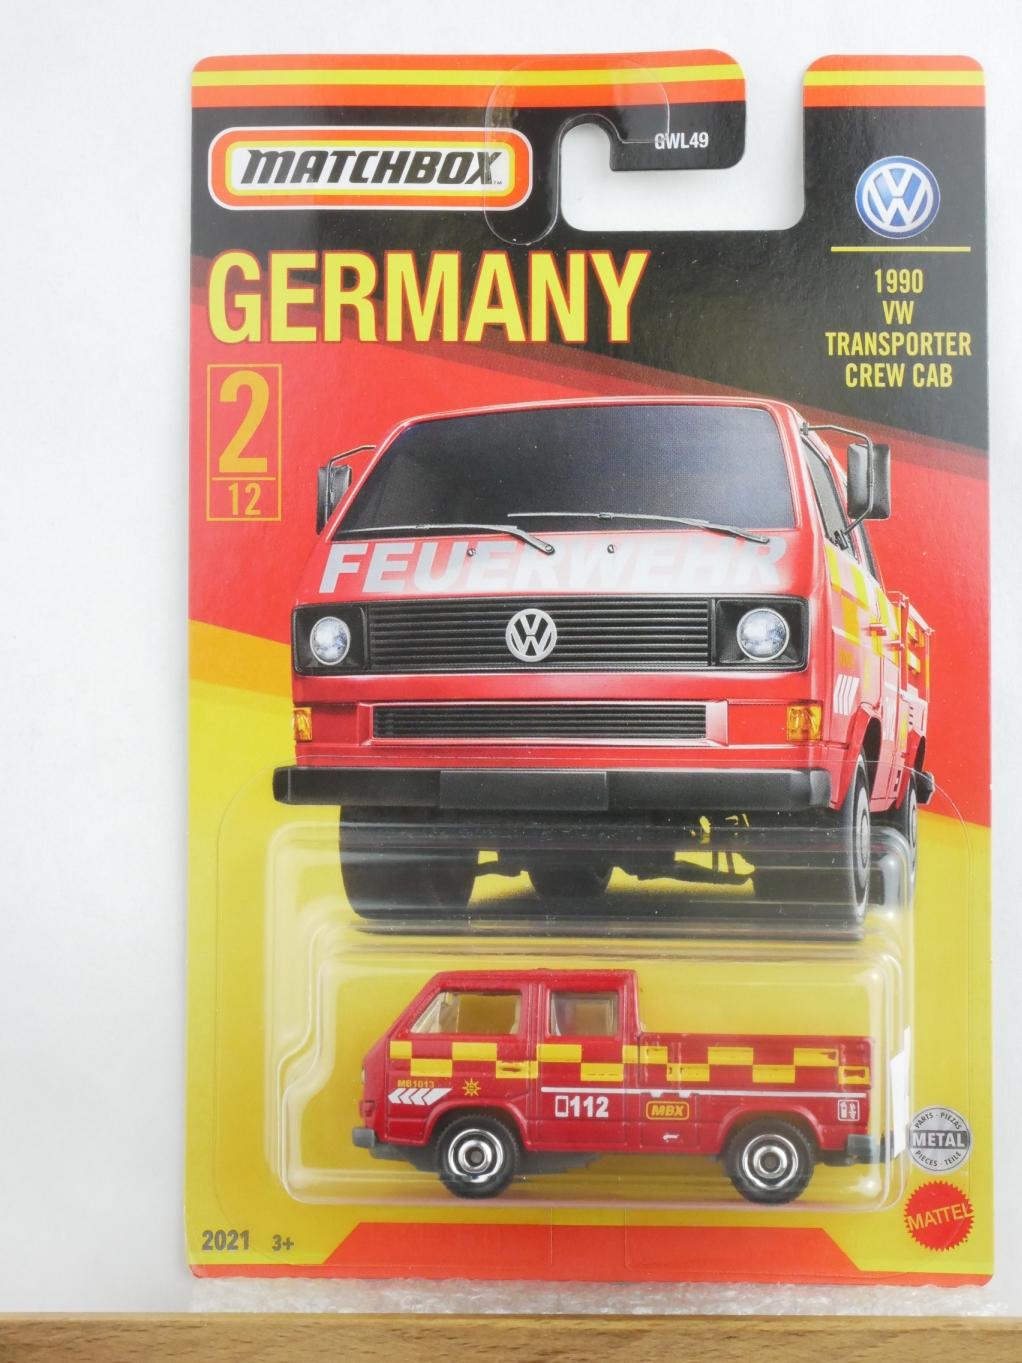 #02 VW Transporter Crew Cab - 12294